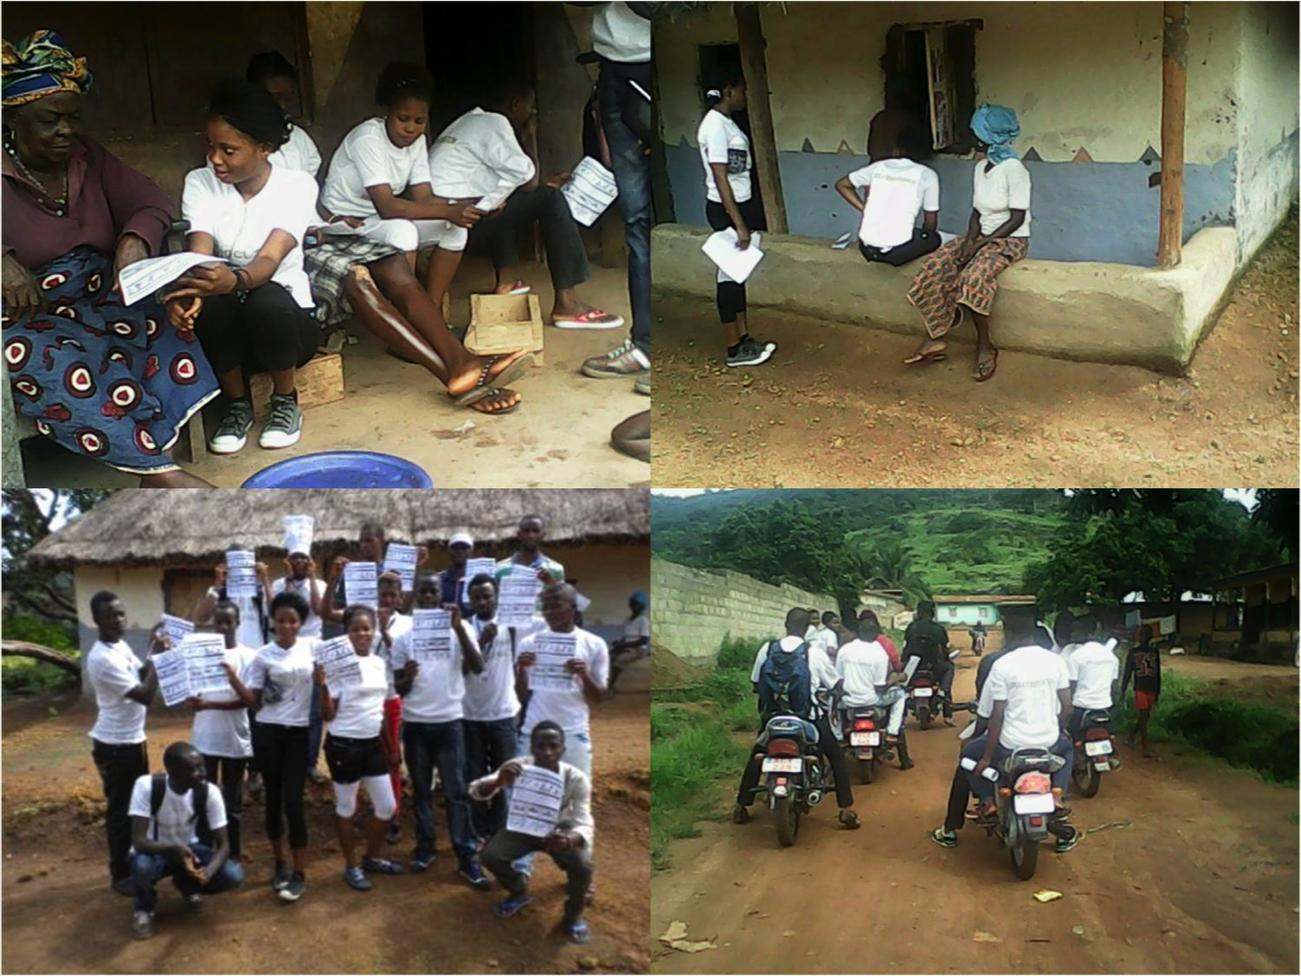 Project1808 Youth Organize to sensitize community on the Ebola virus